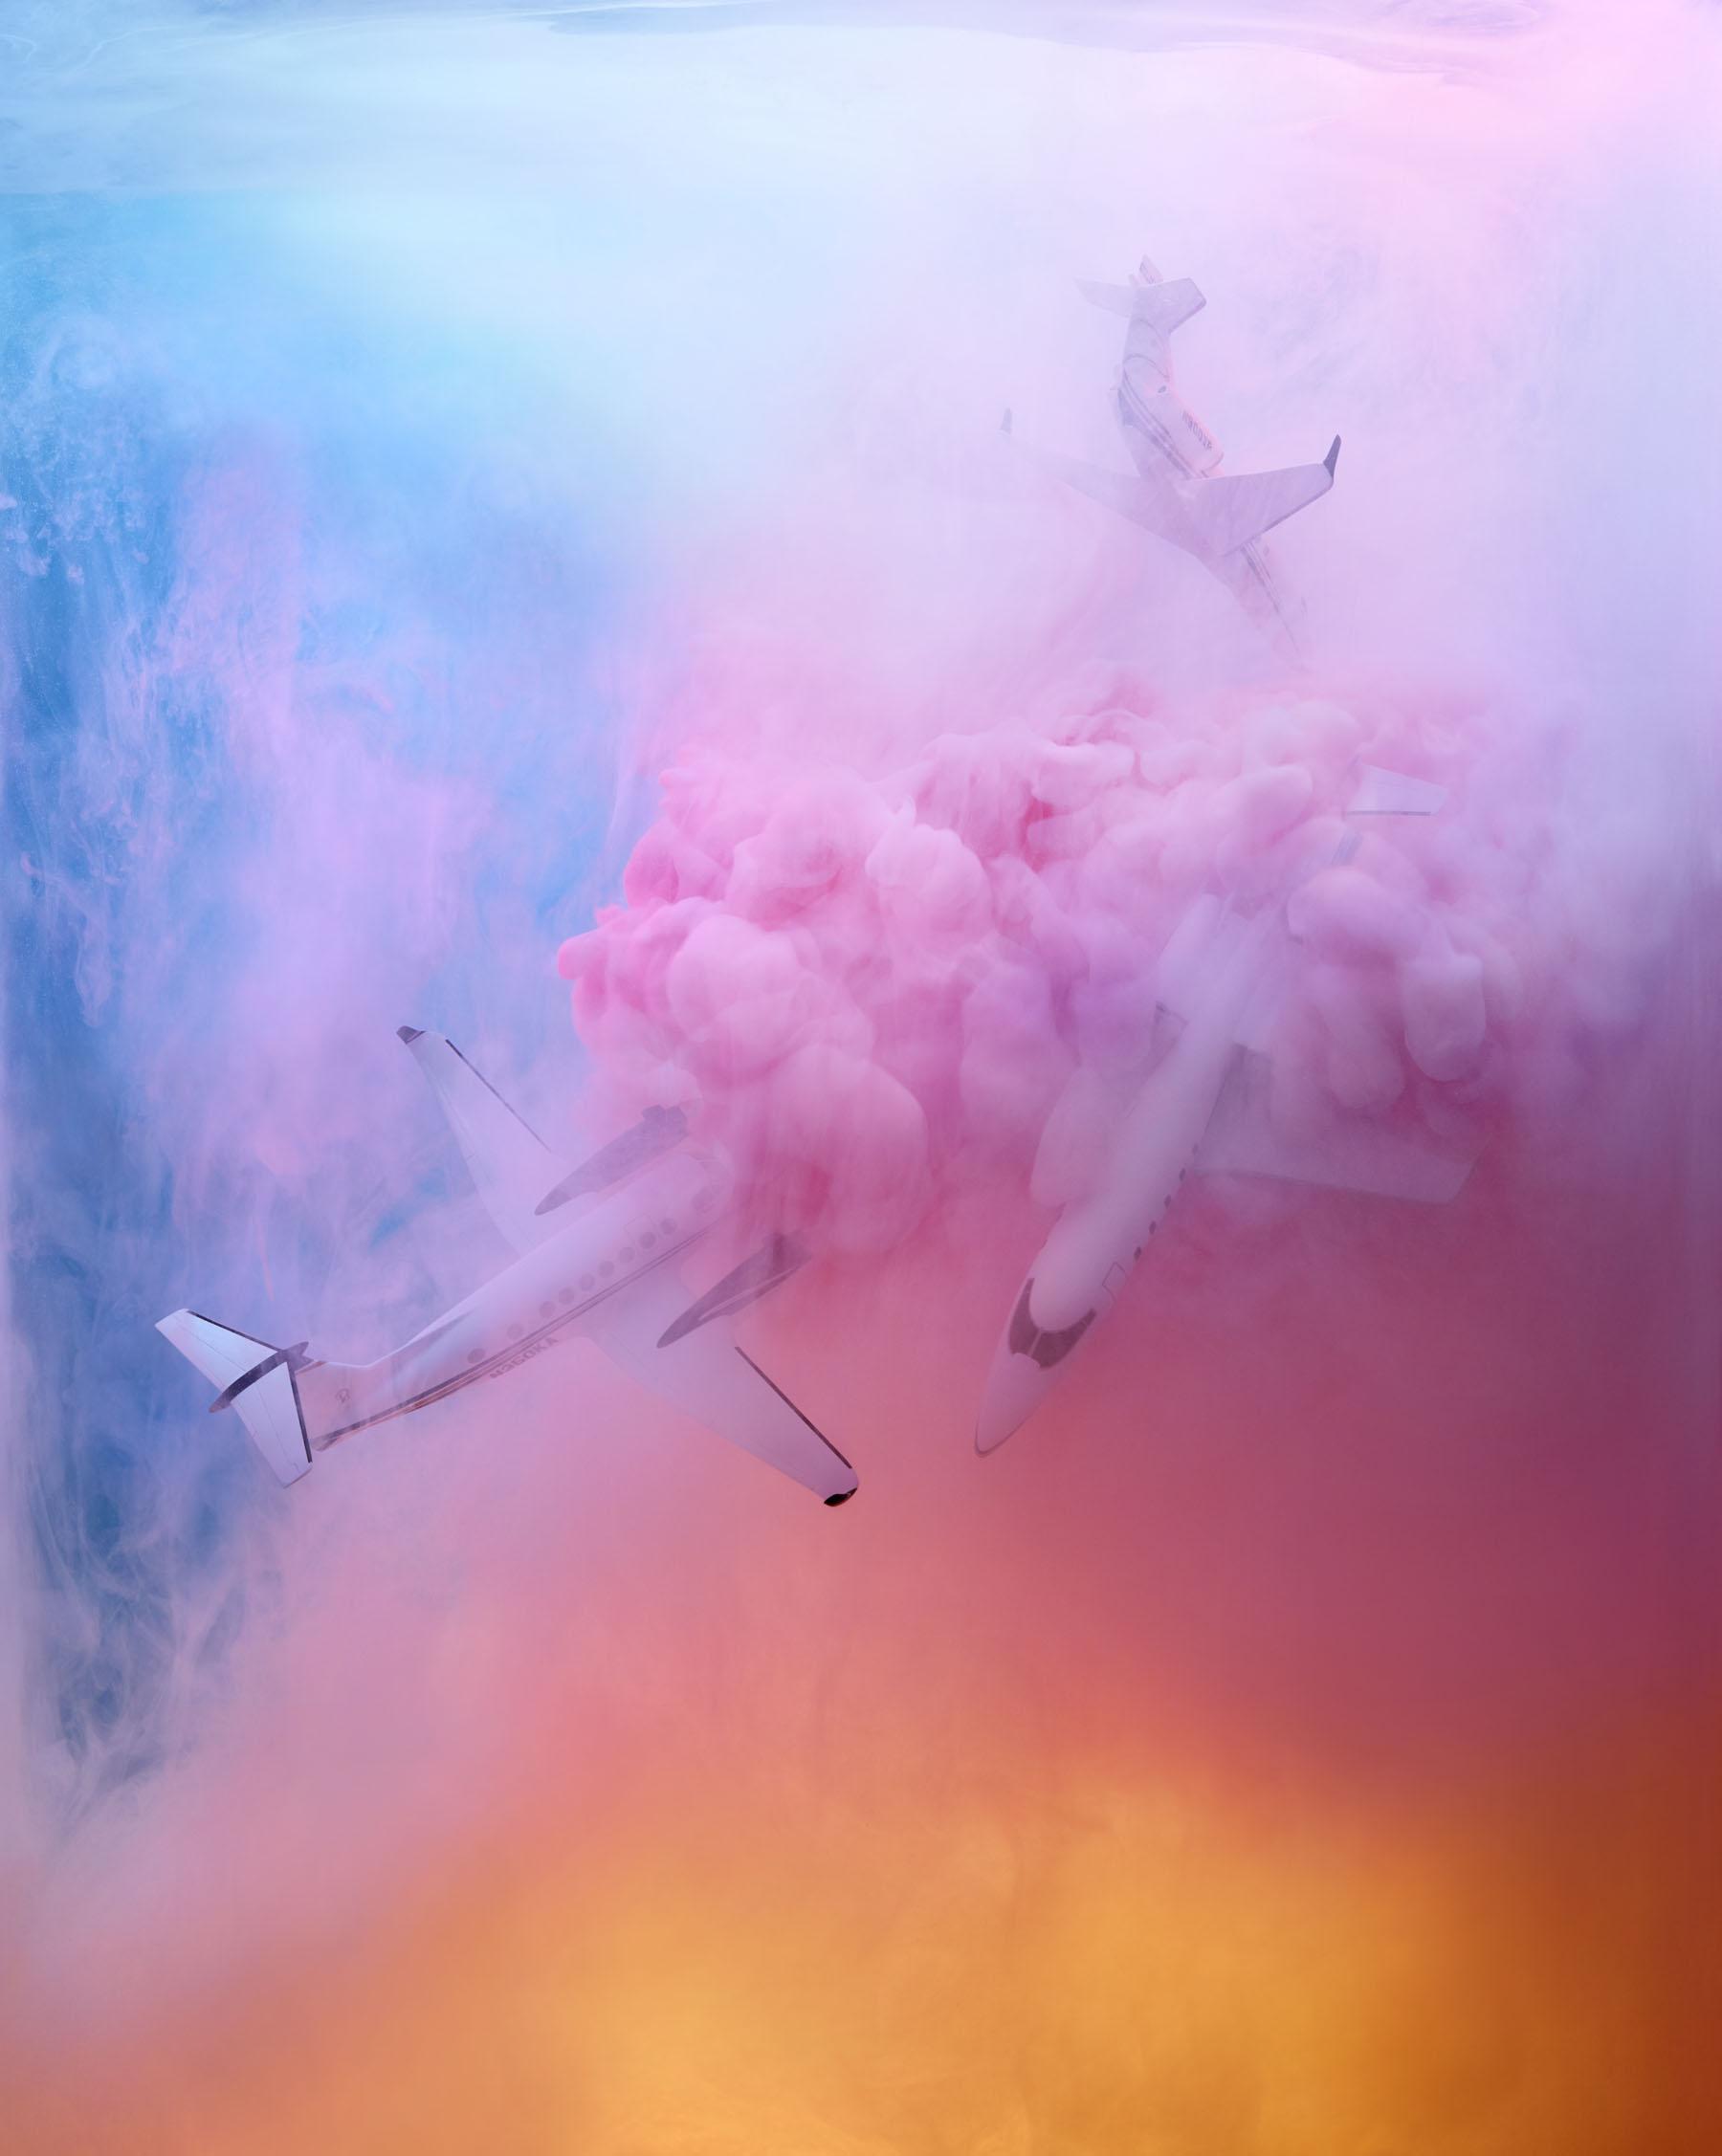 David LaChapelle, Aristocracy Two, 2014 © David LaChapelle